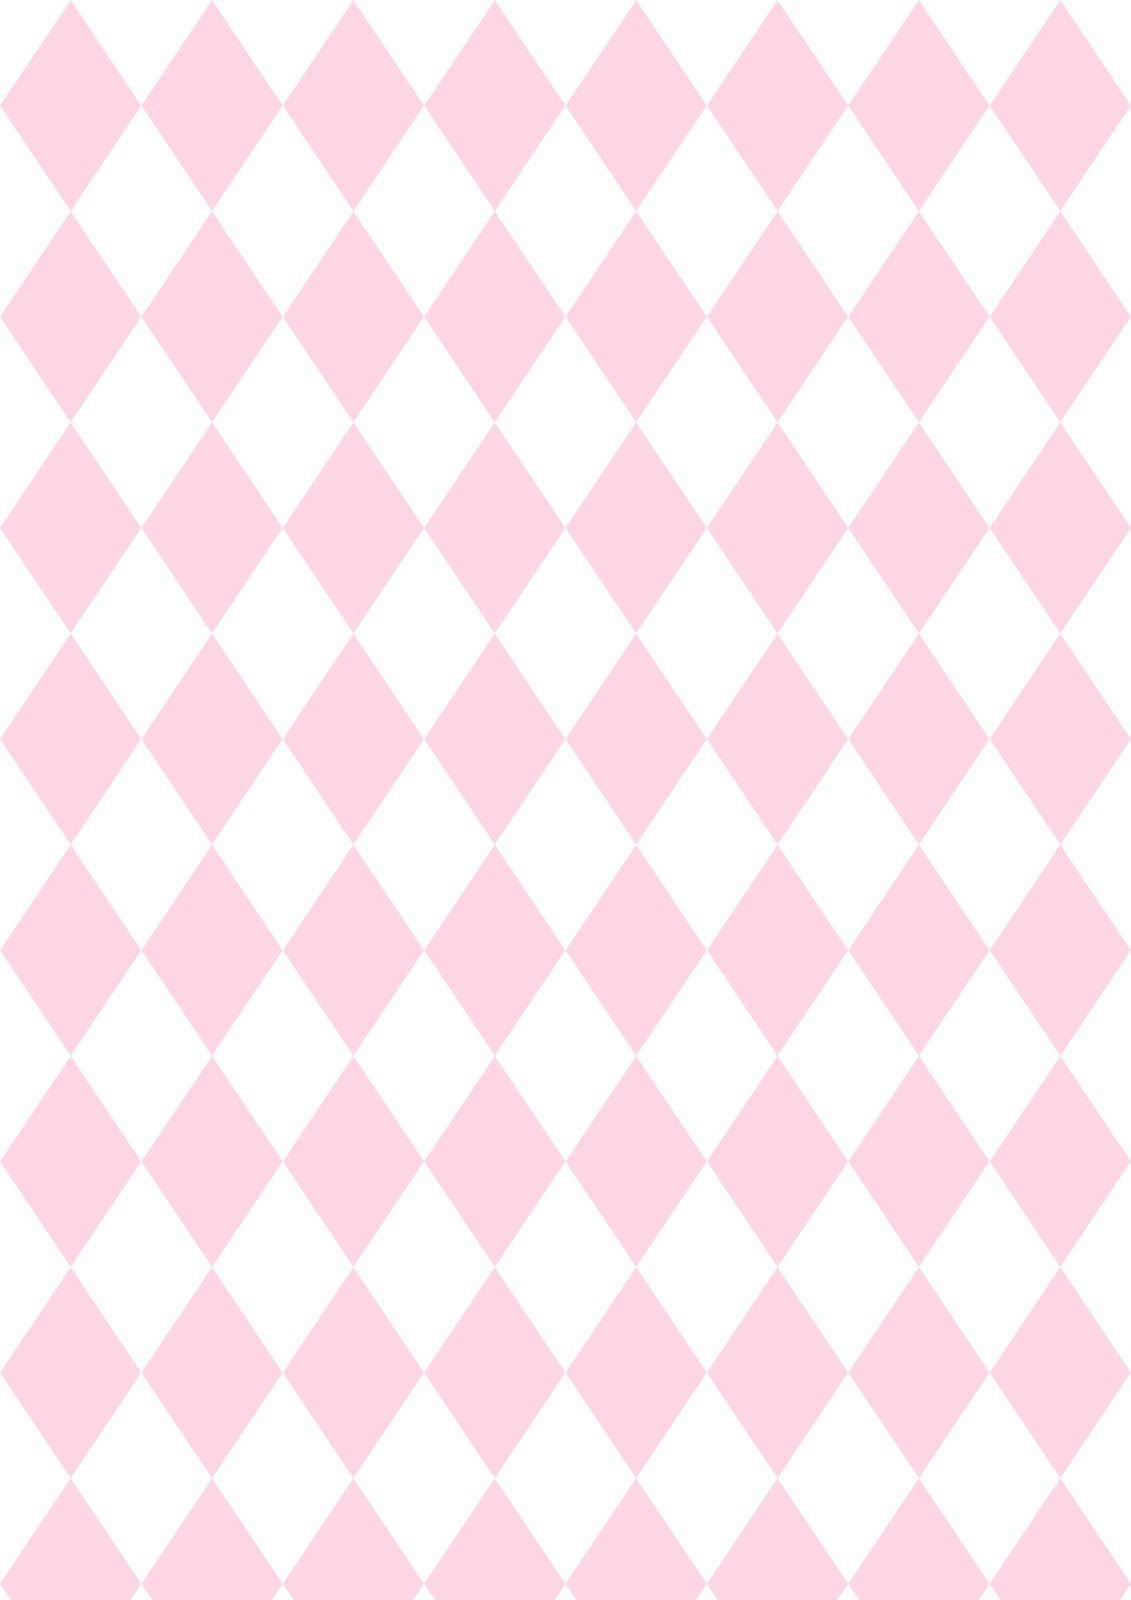 Free Digital Pink Harlequin Scrapbooking Paper Ausdruckbares